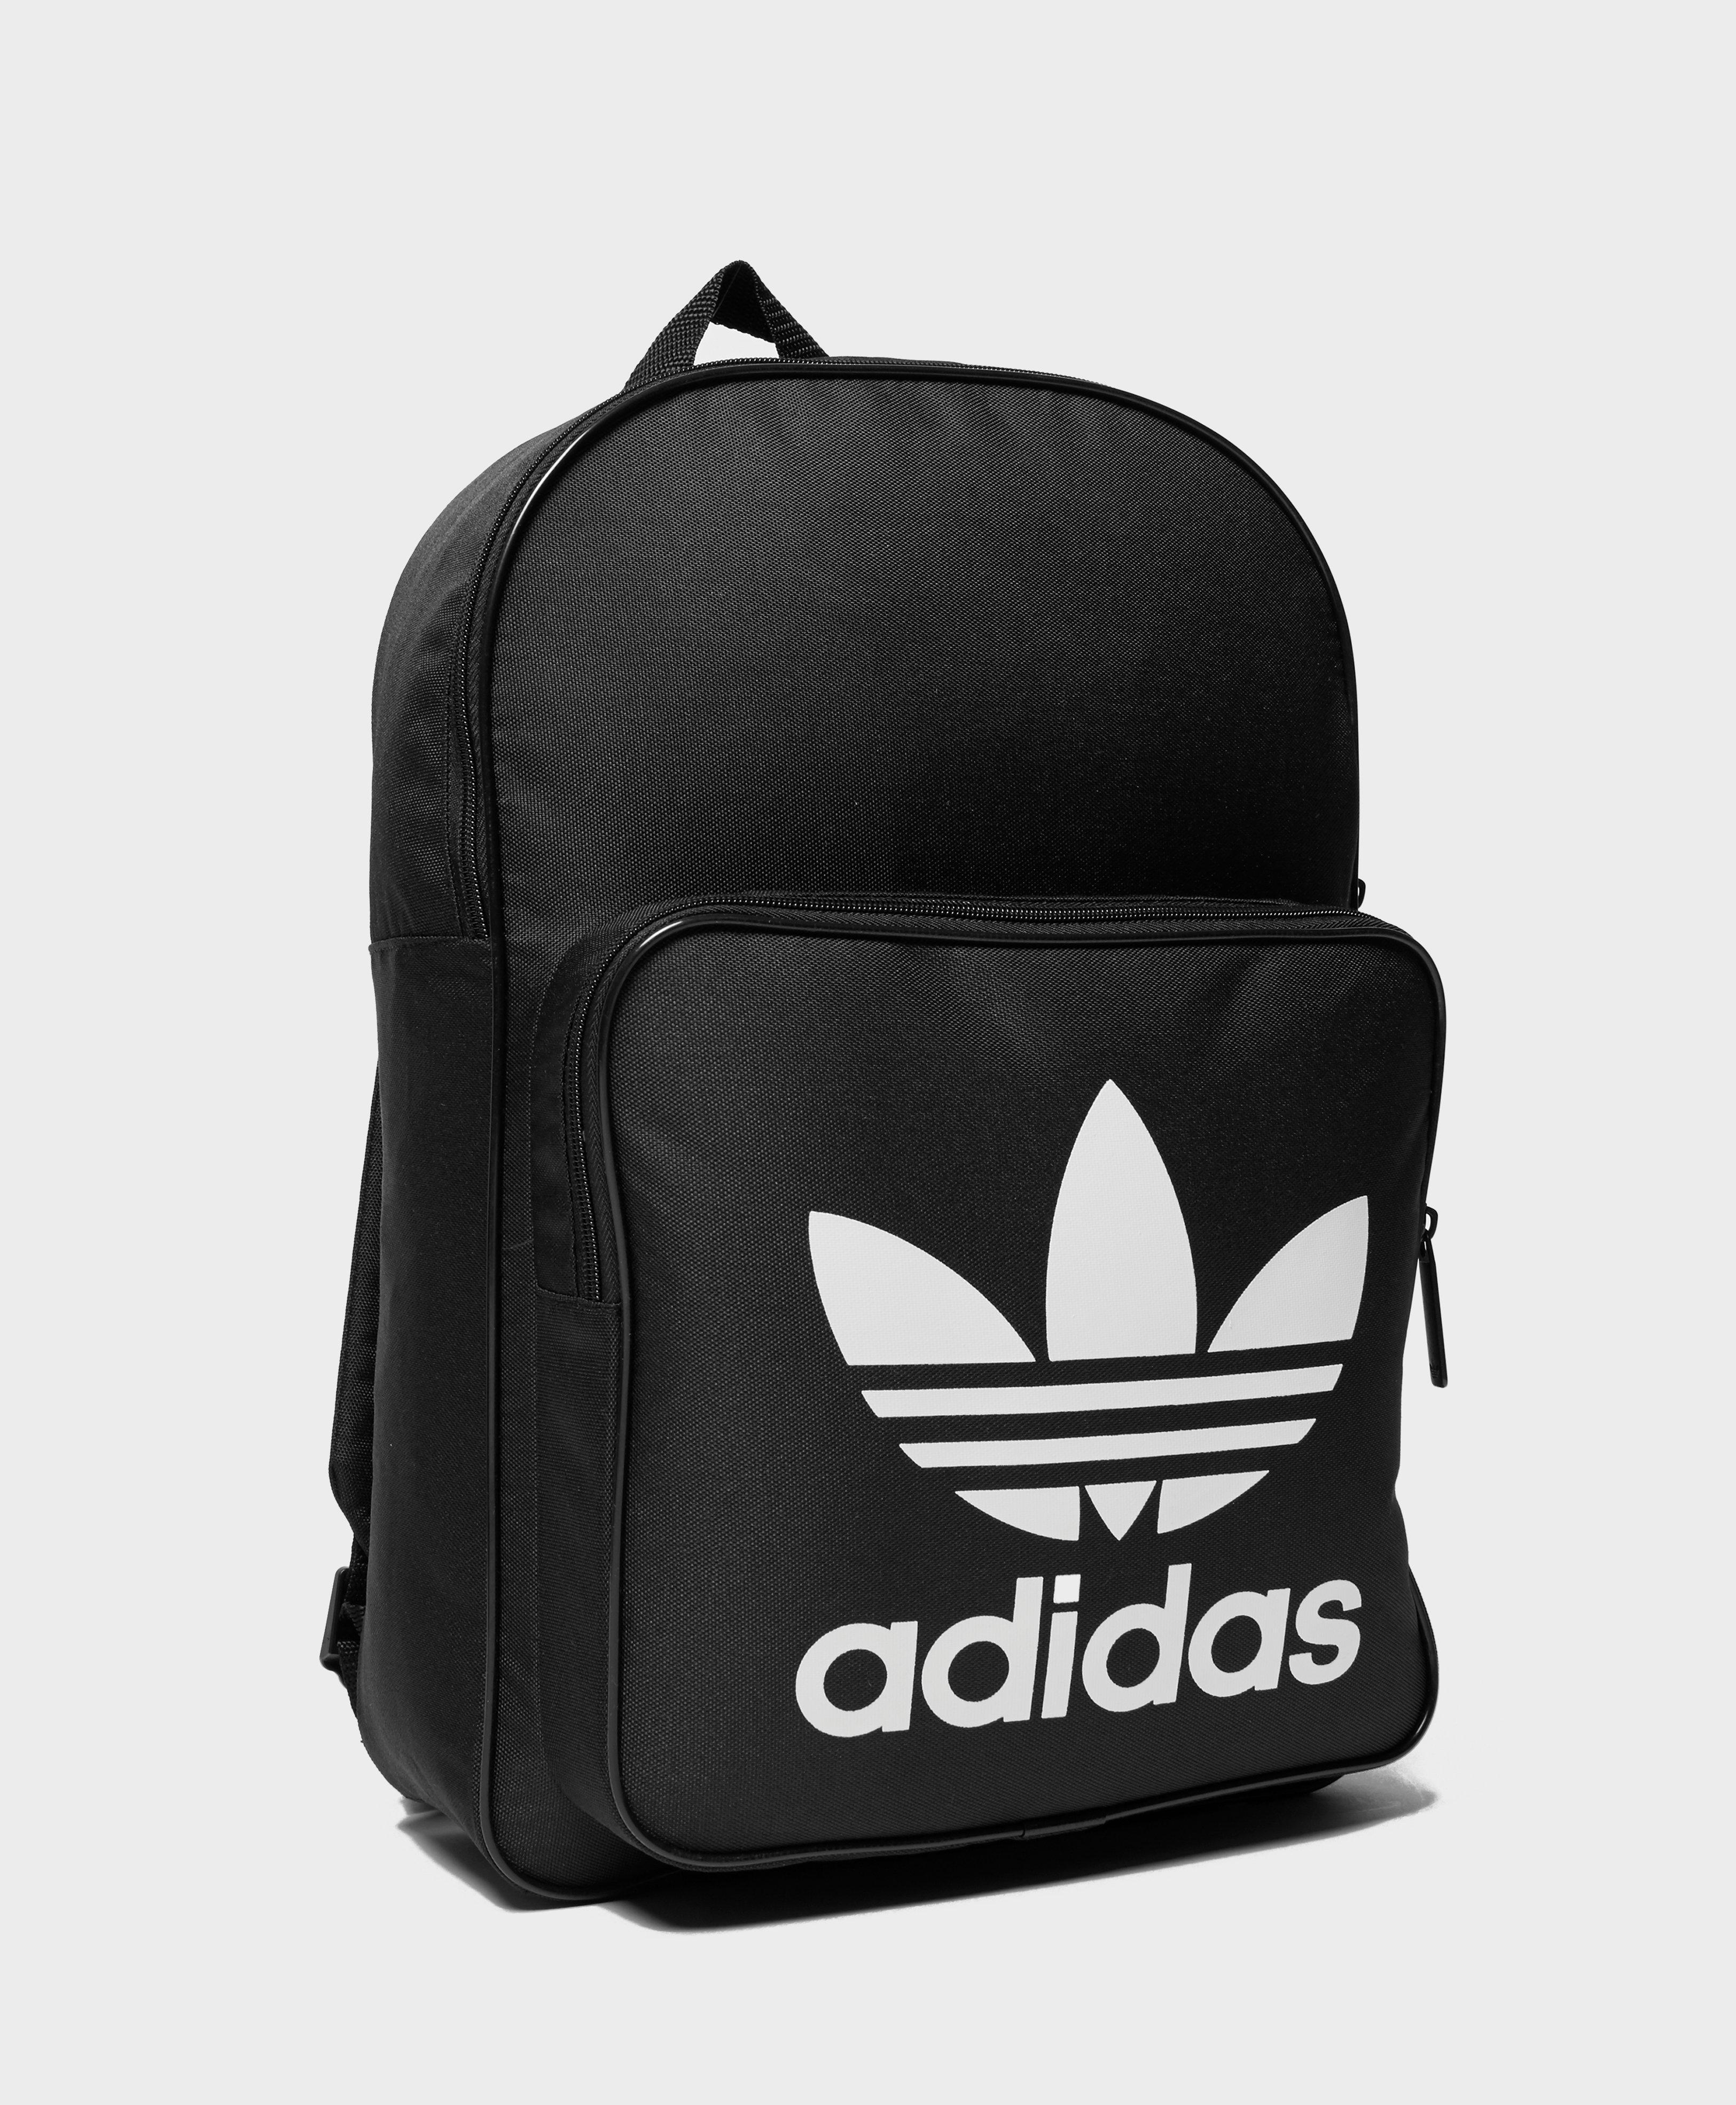 c0c344a148b adidas Originals Classic Trefoil Backpack in Black for Men - Save 24% - Lyst